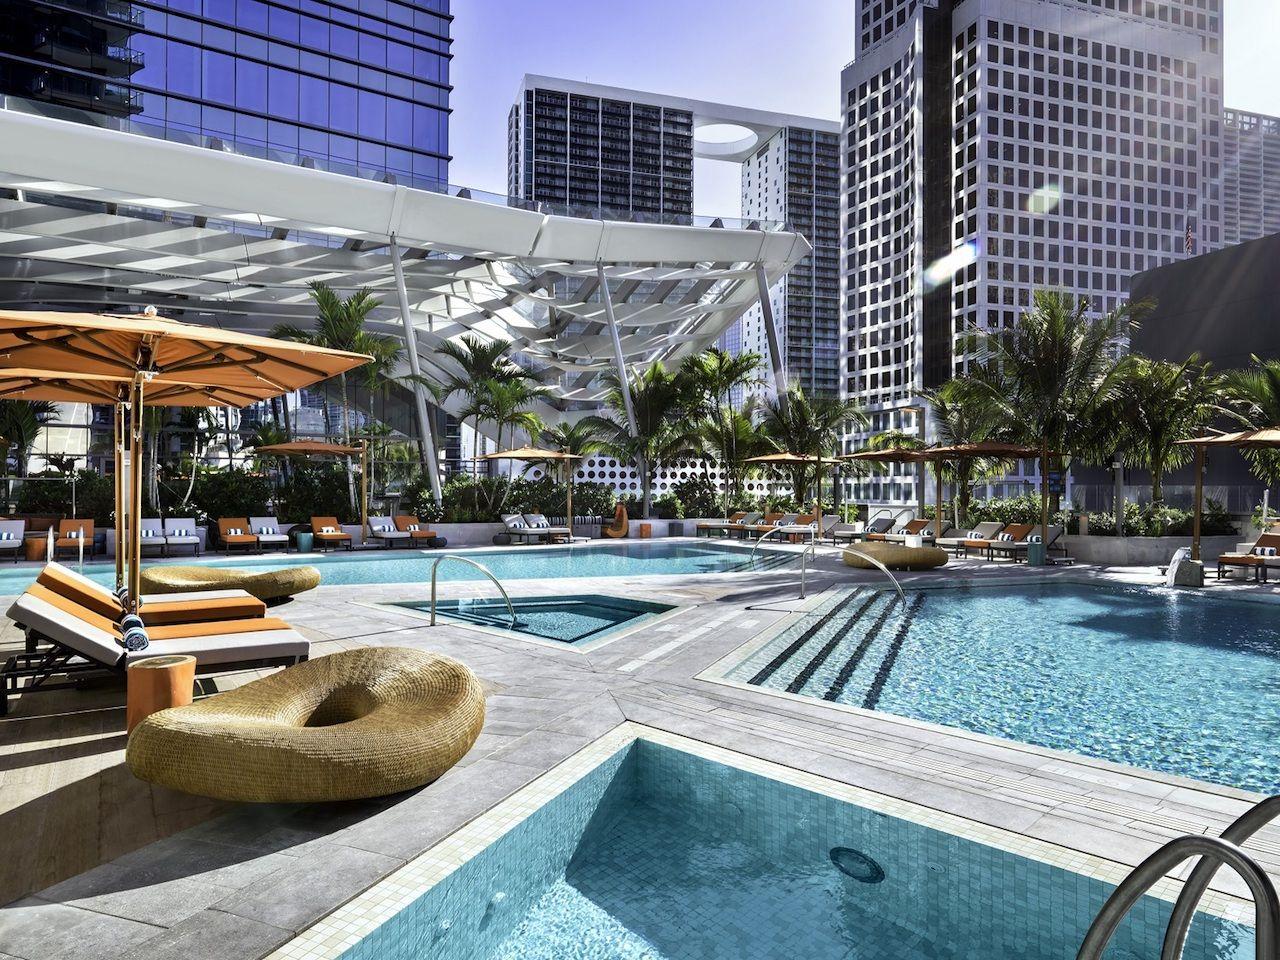 Miami East Hotel